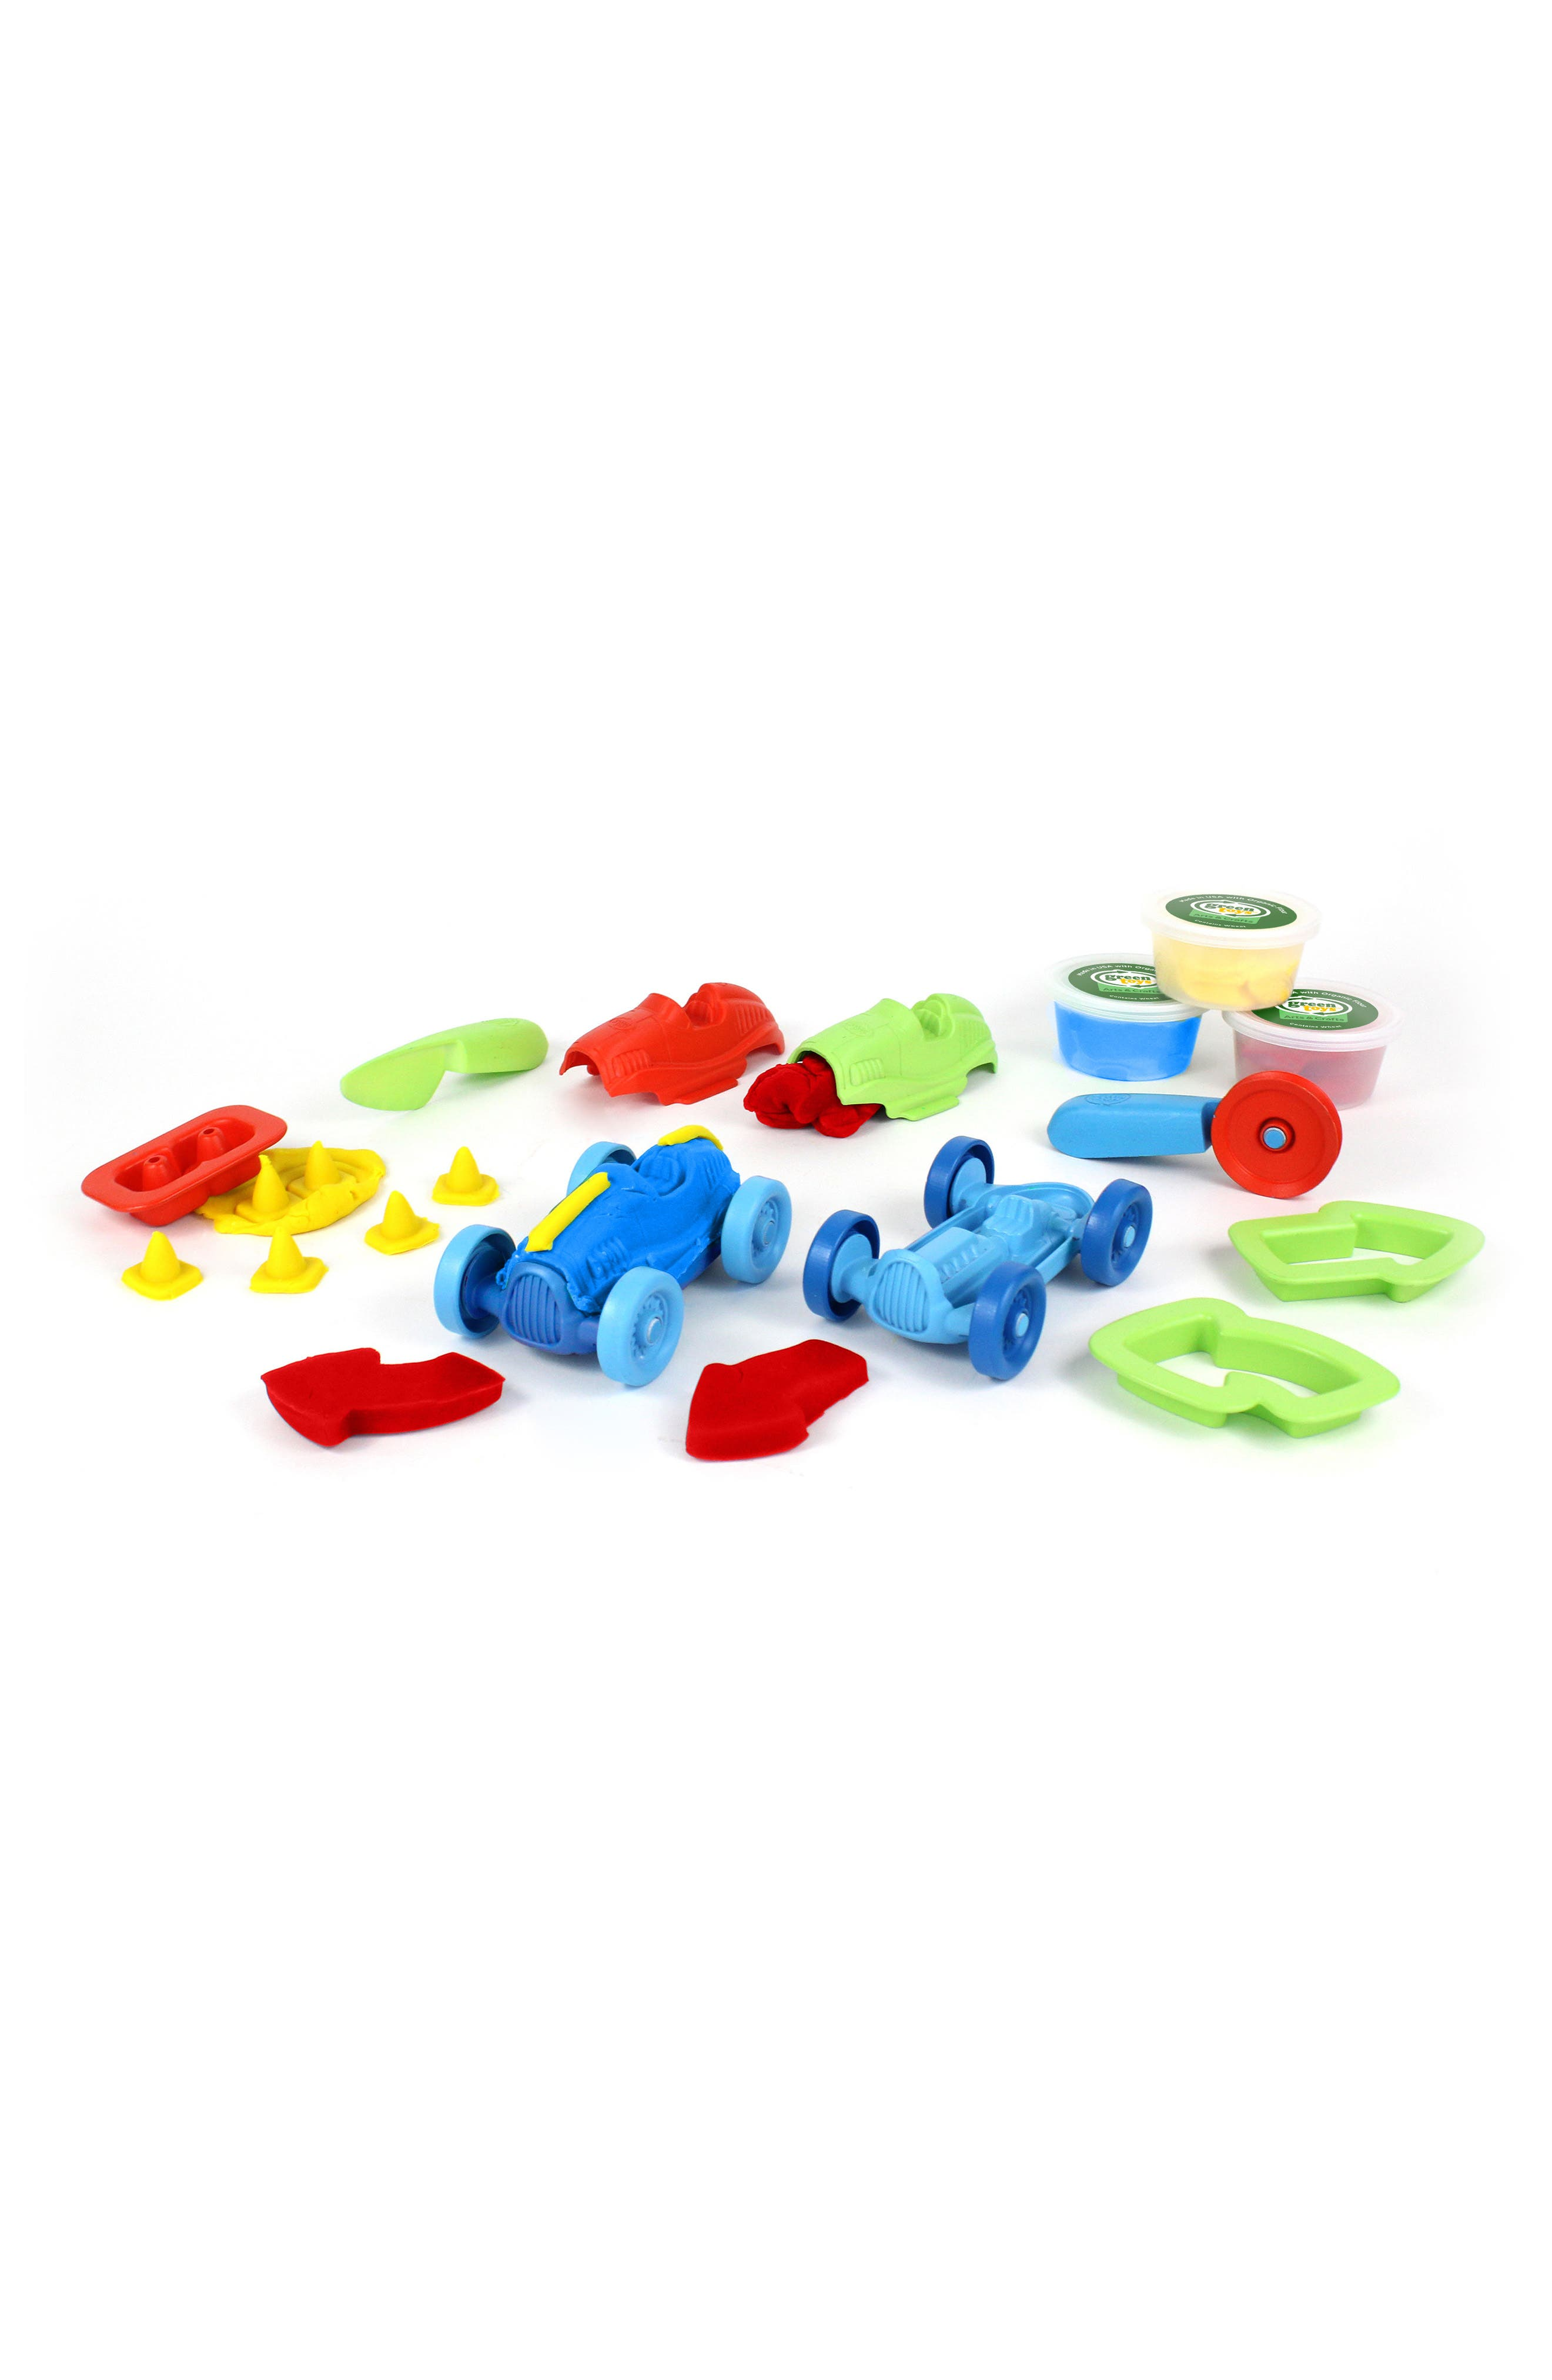 Alternate Image 1 Selected - Green Toys 12-Piece Plastic Racecar Maker Dough Set